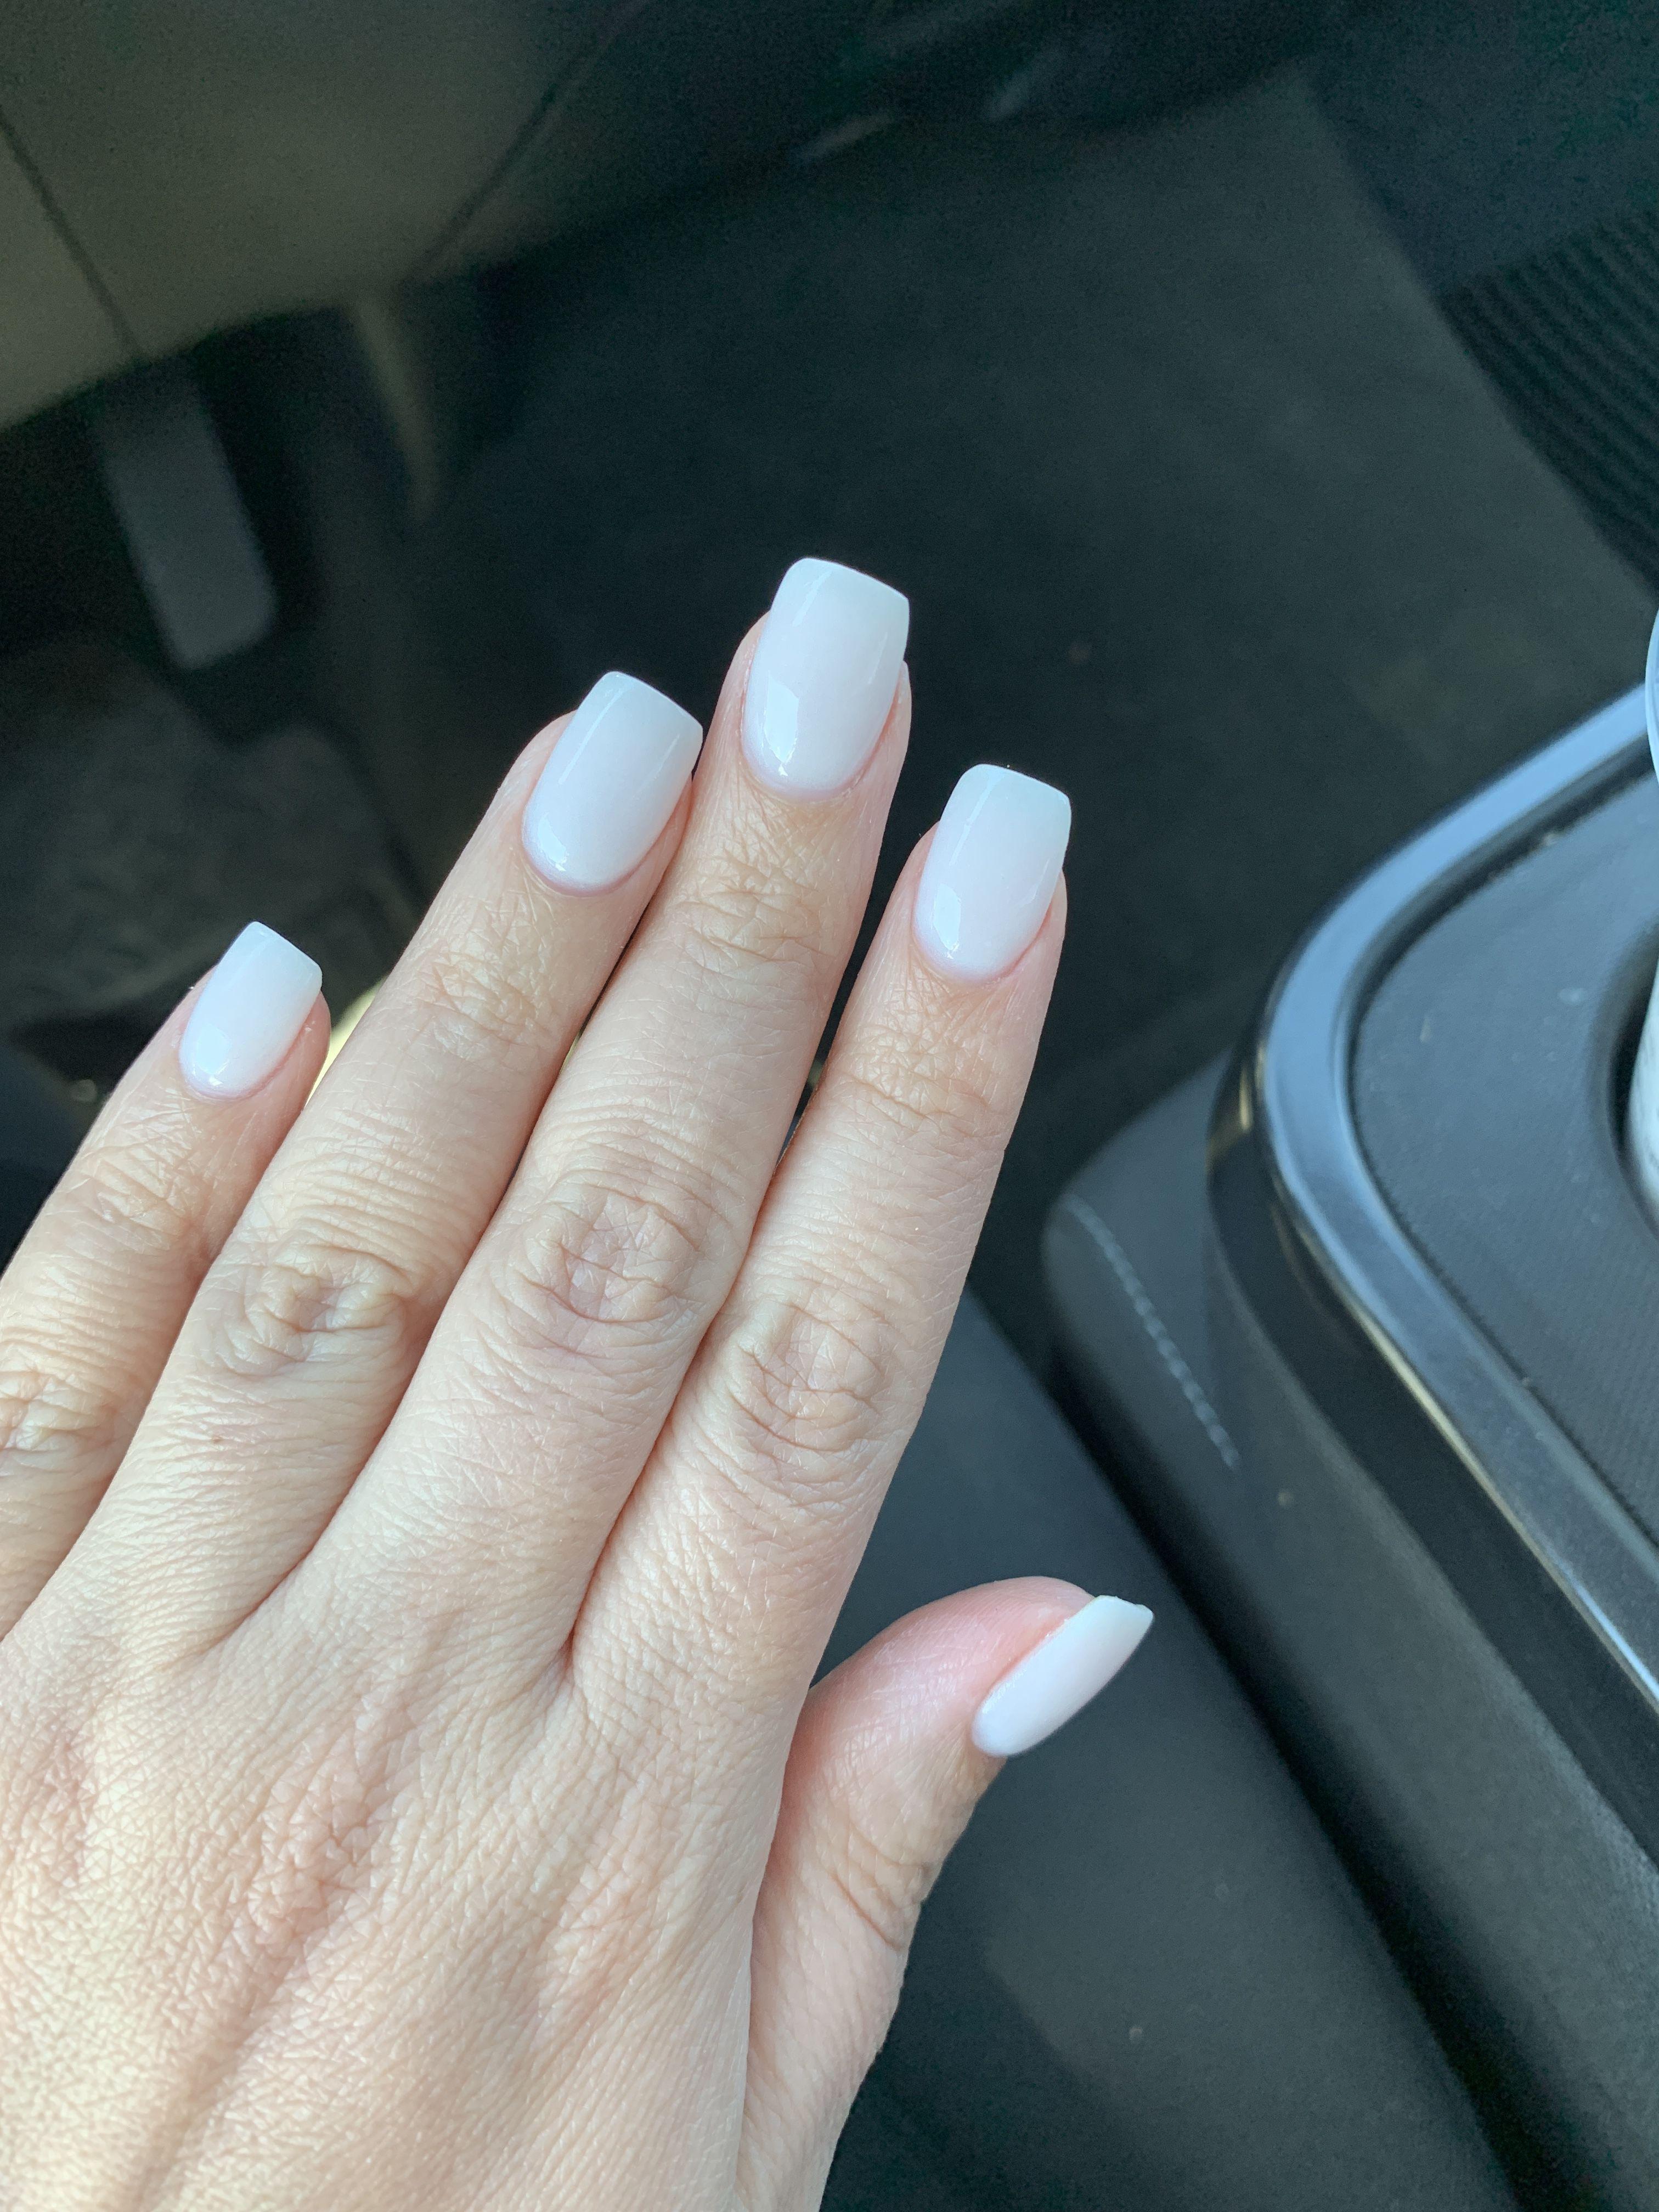 Creamy White Acrylic Nails